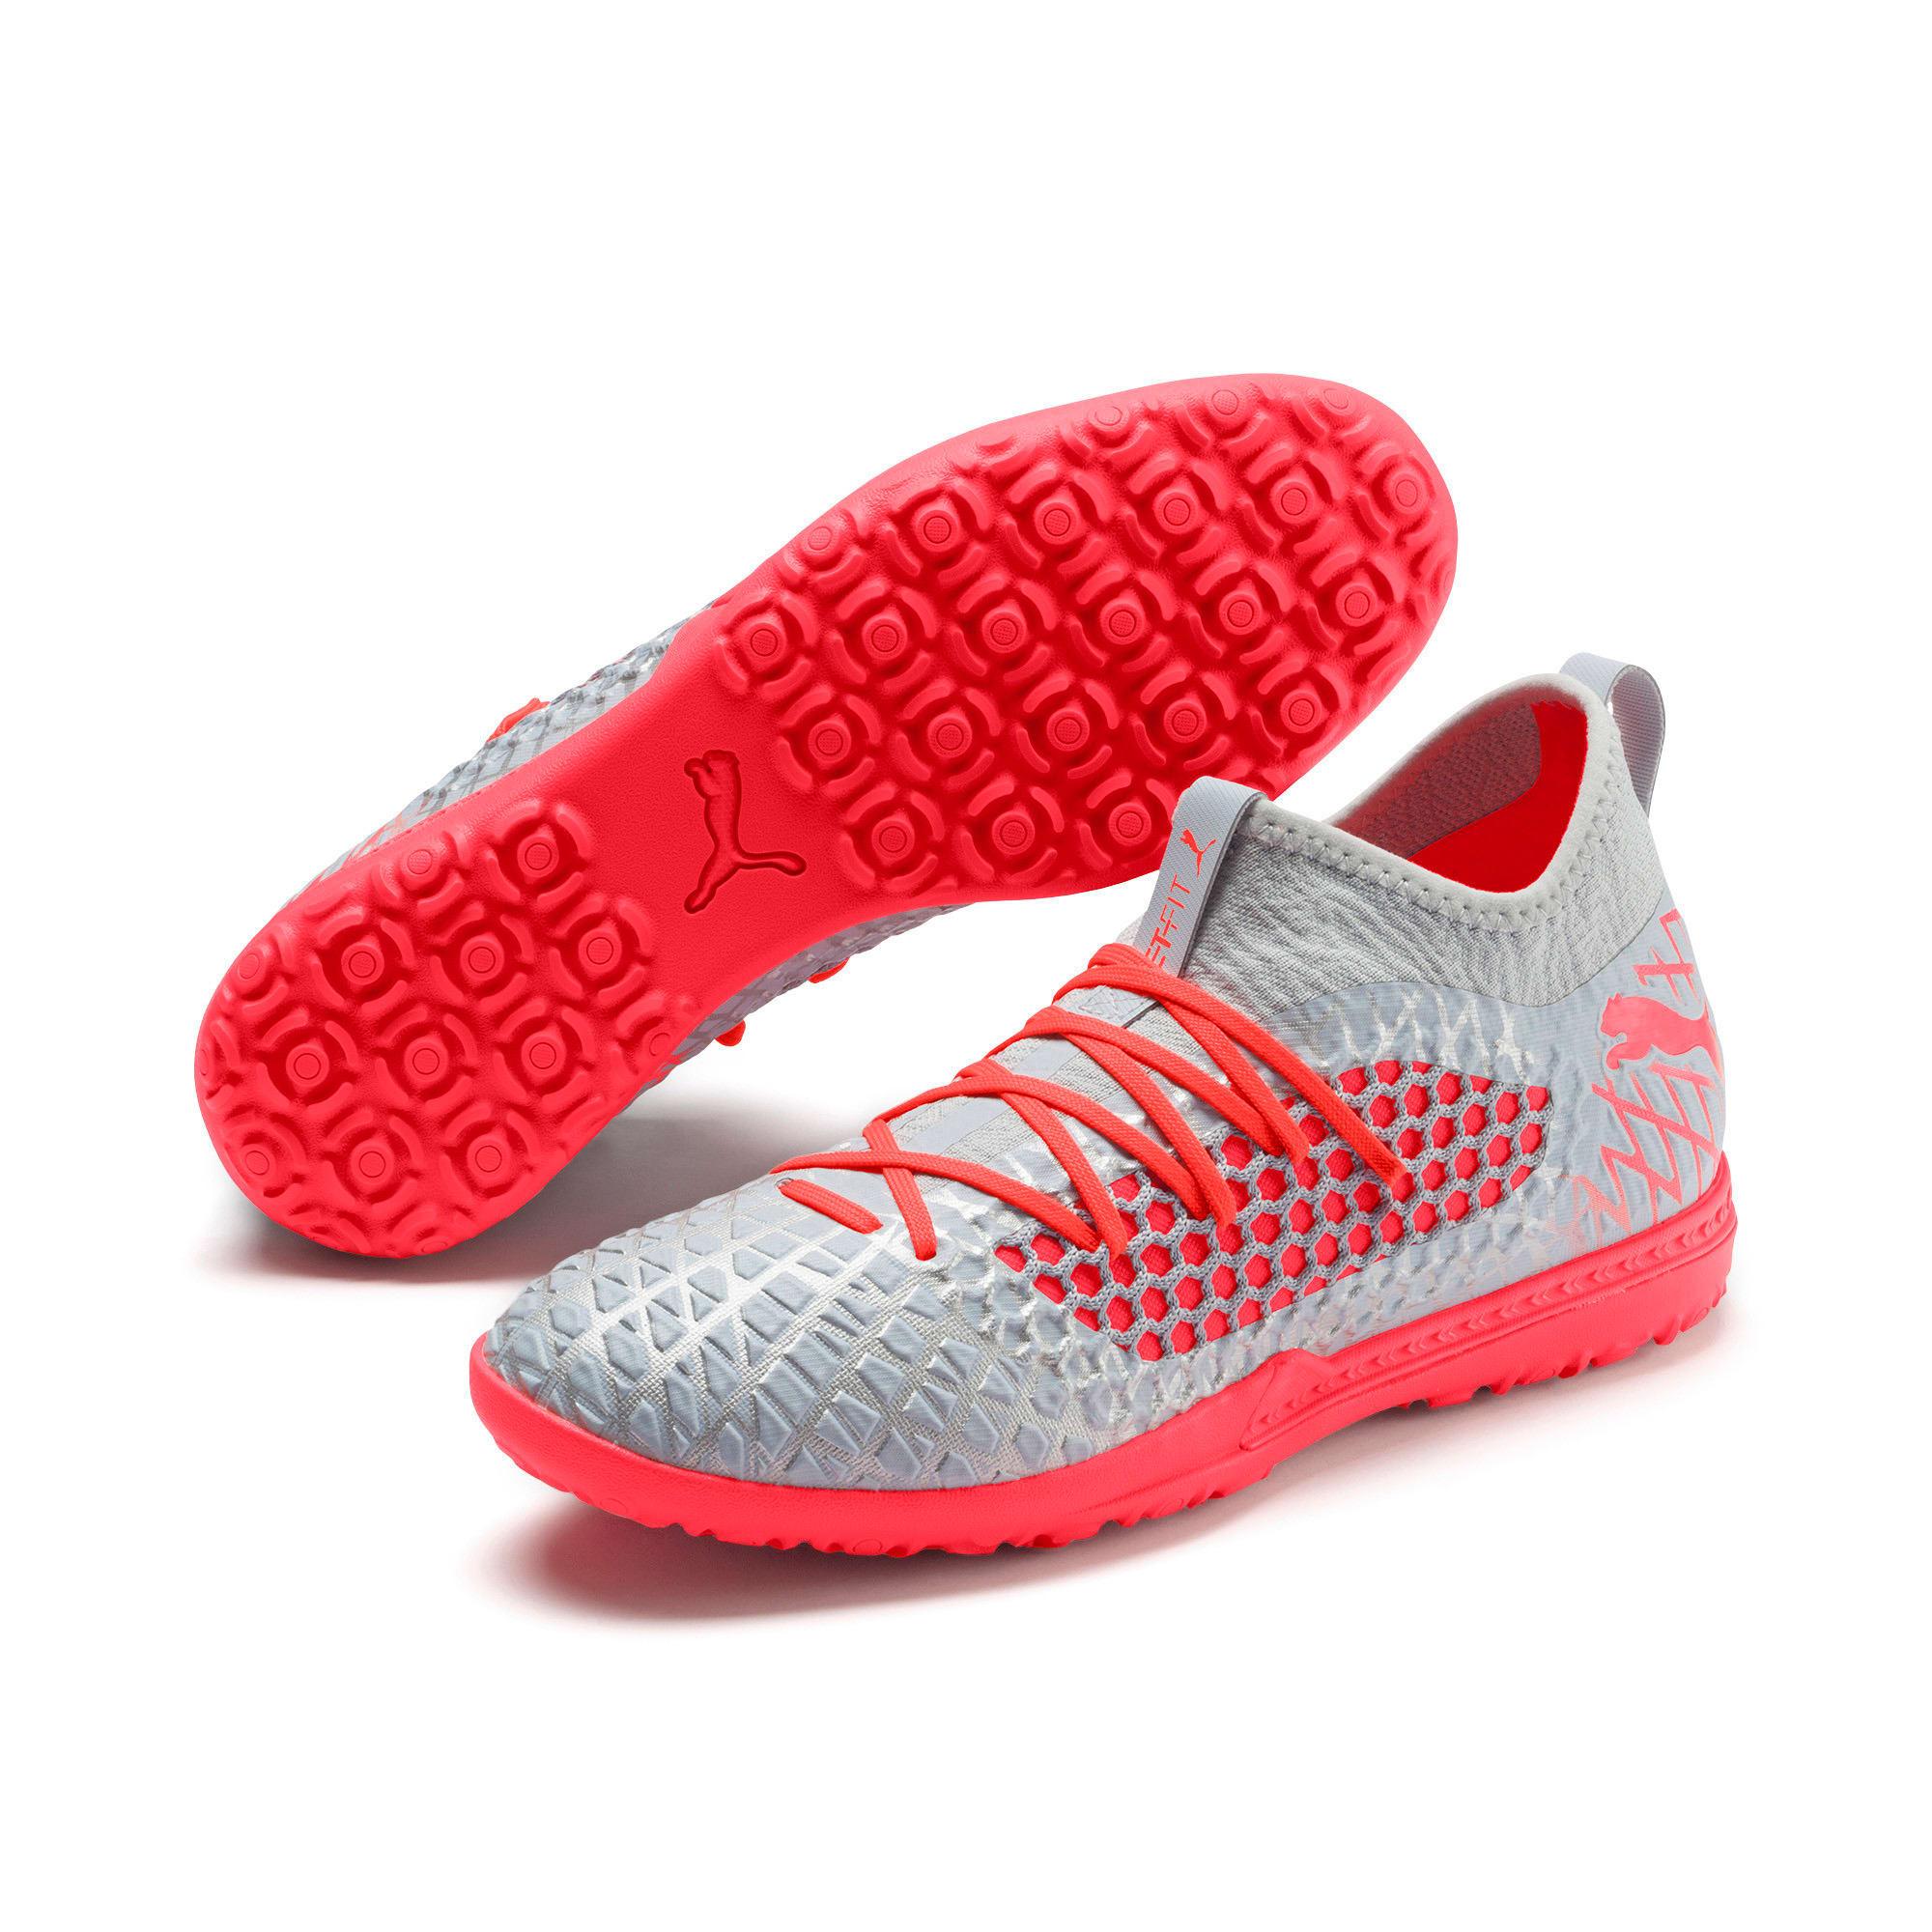 Thumbnail 3 of FUTURE 4.3 NETFIT TT Men's Soccer Shoes, Glacial Blue-Nrgy Red, medium